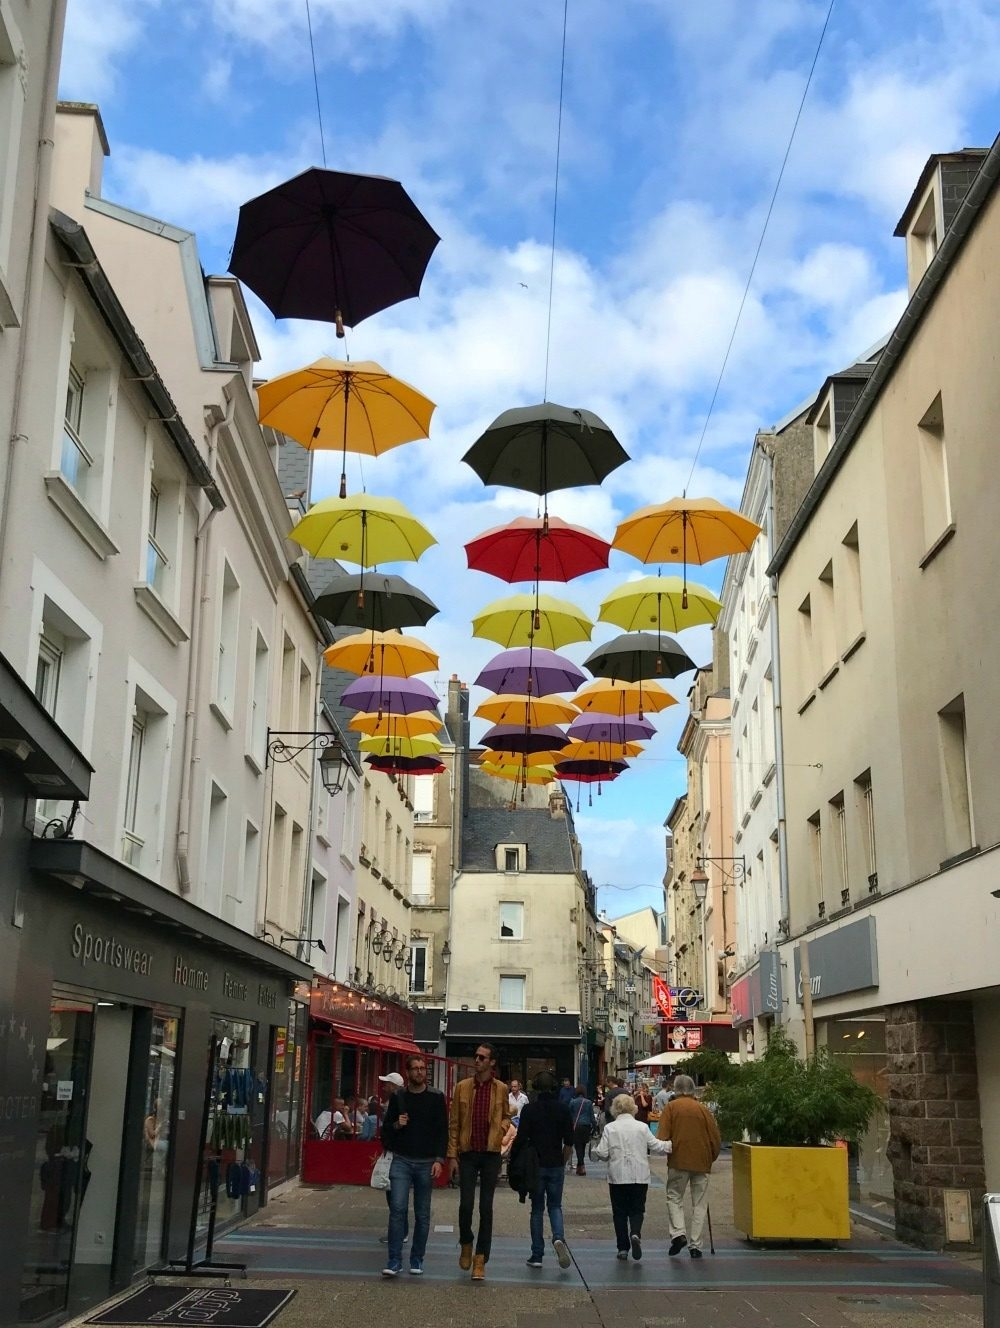 Parapluies of Cherbourg with Azamara Pursuit